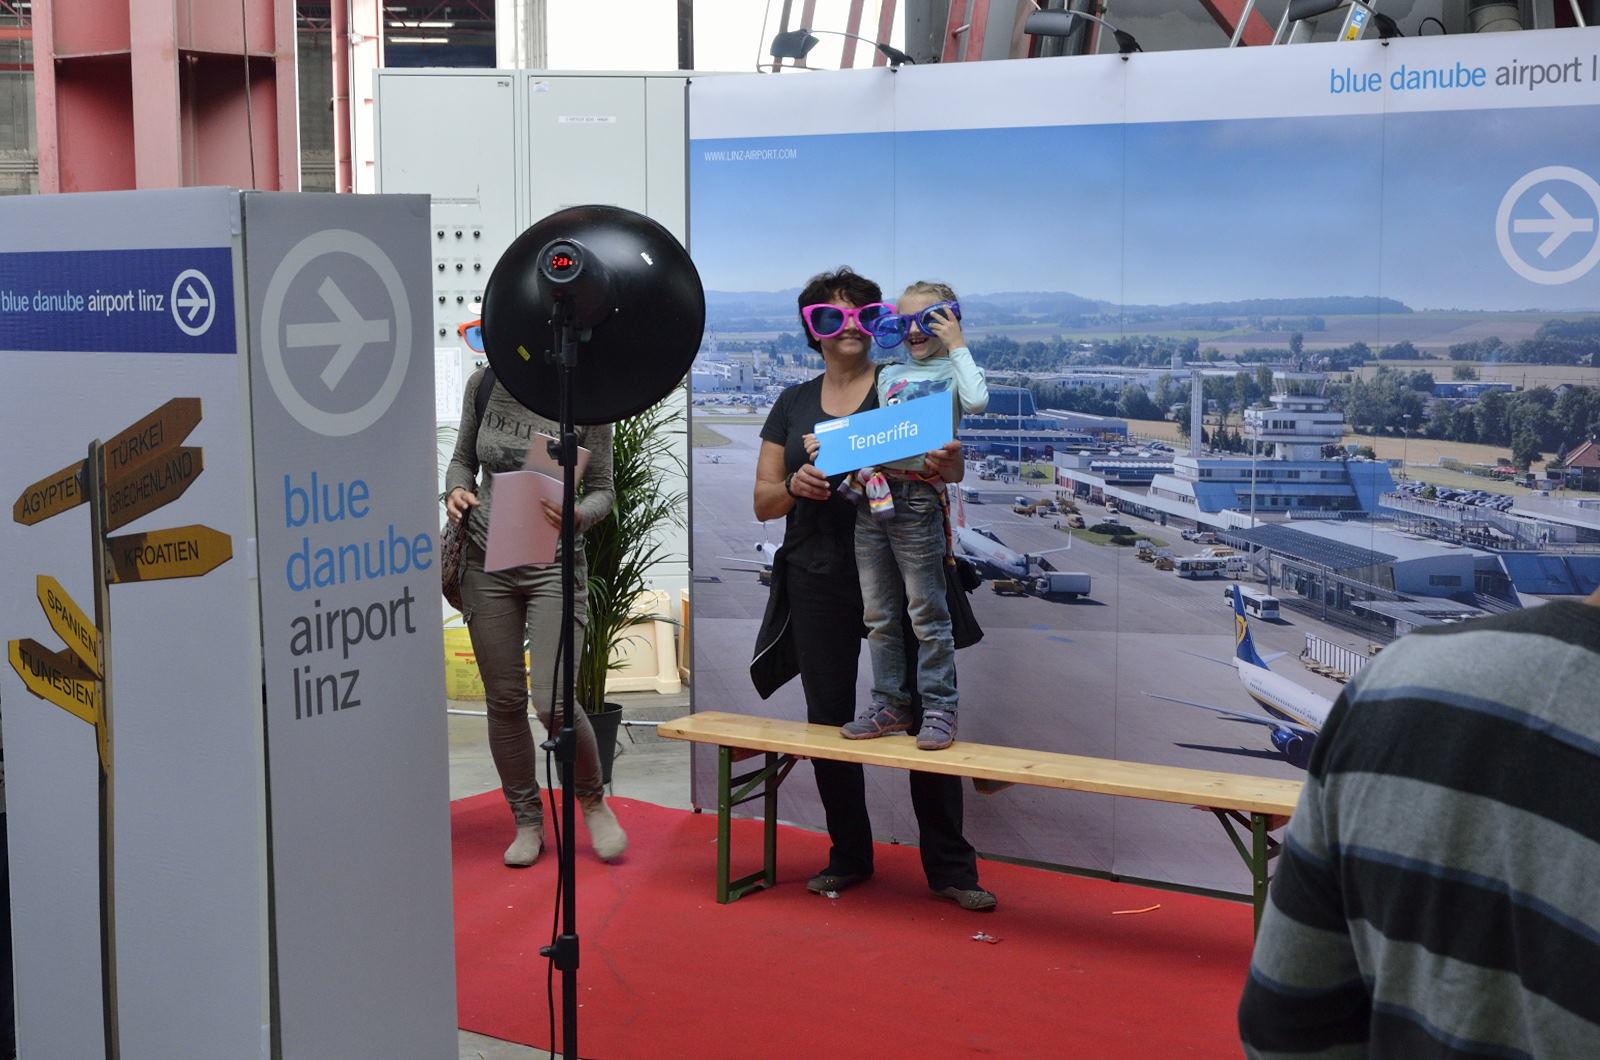 #TagderLuftfahrt #BlueDanubeAirport #KOOPlive